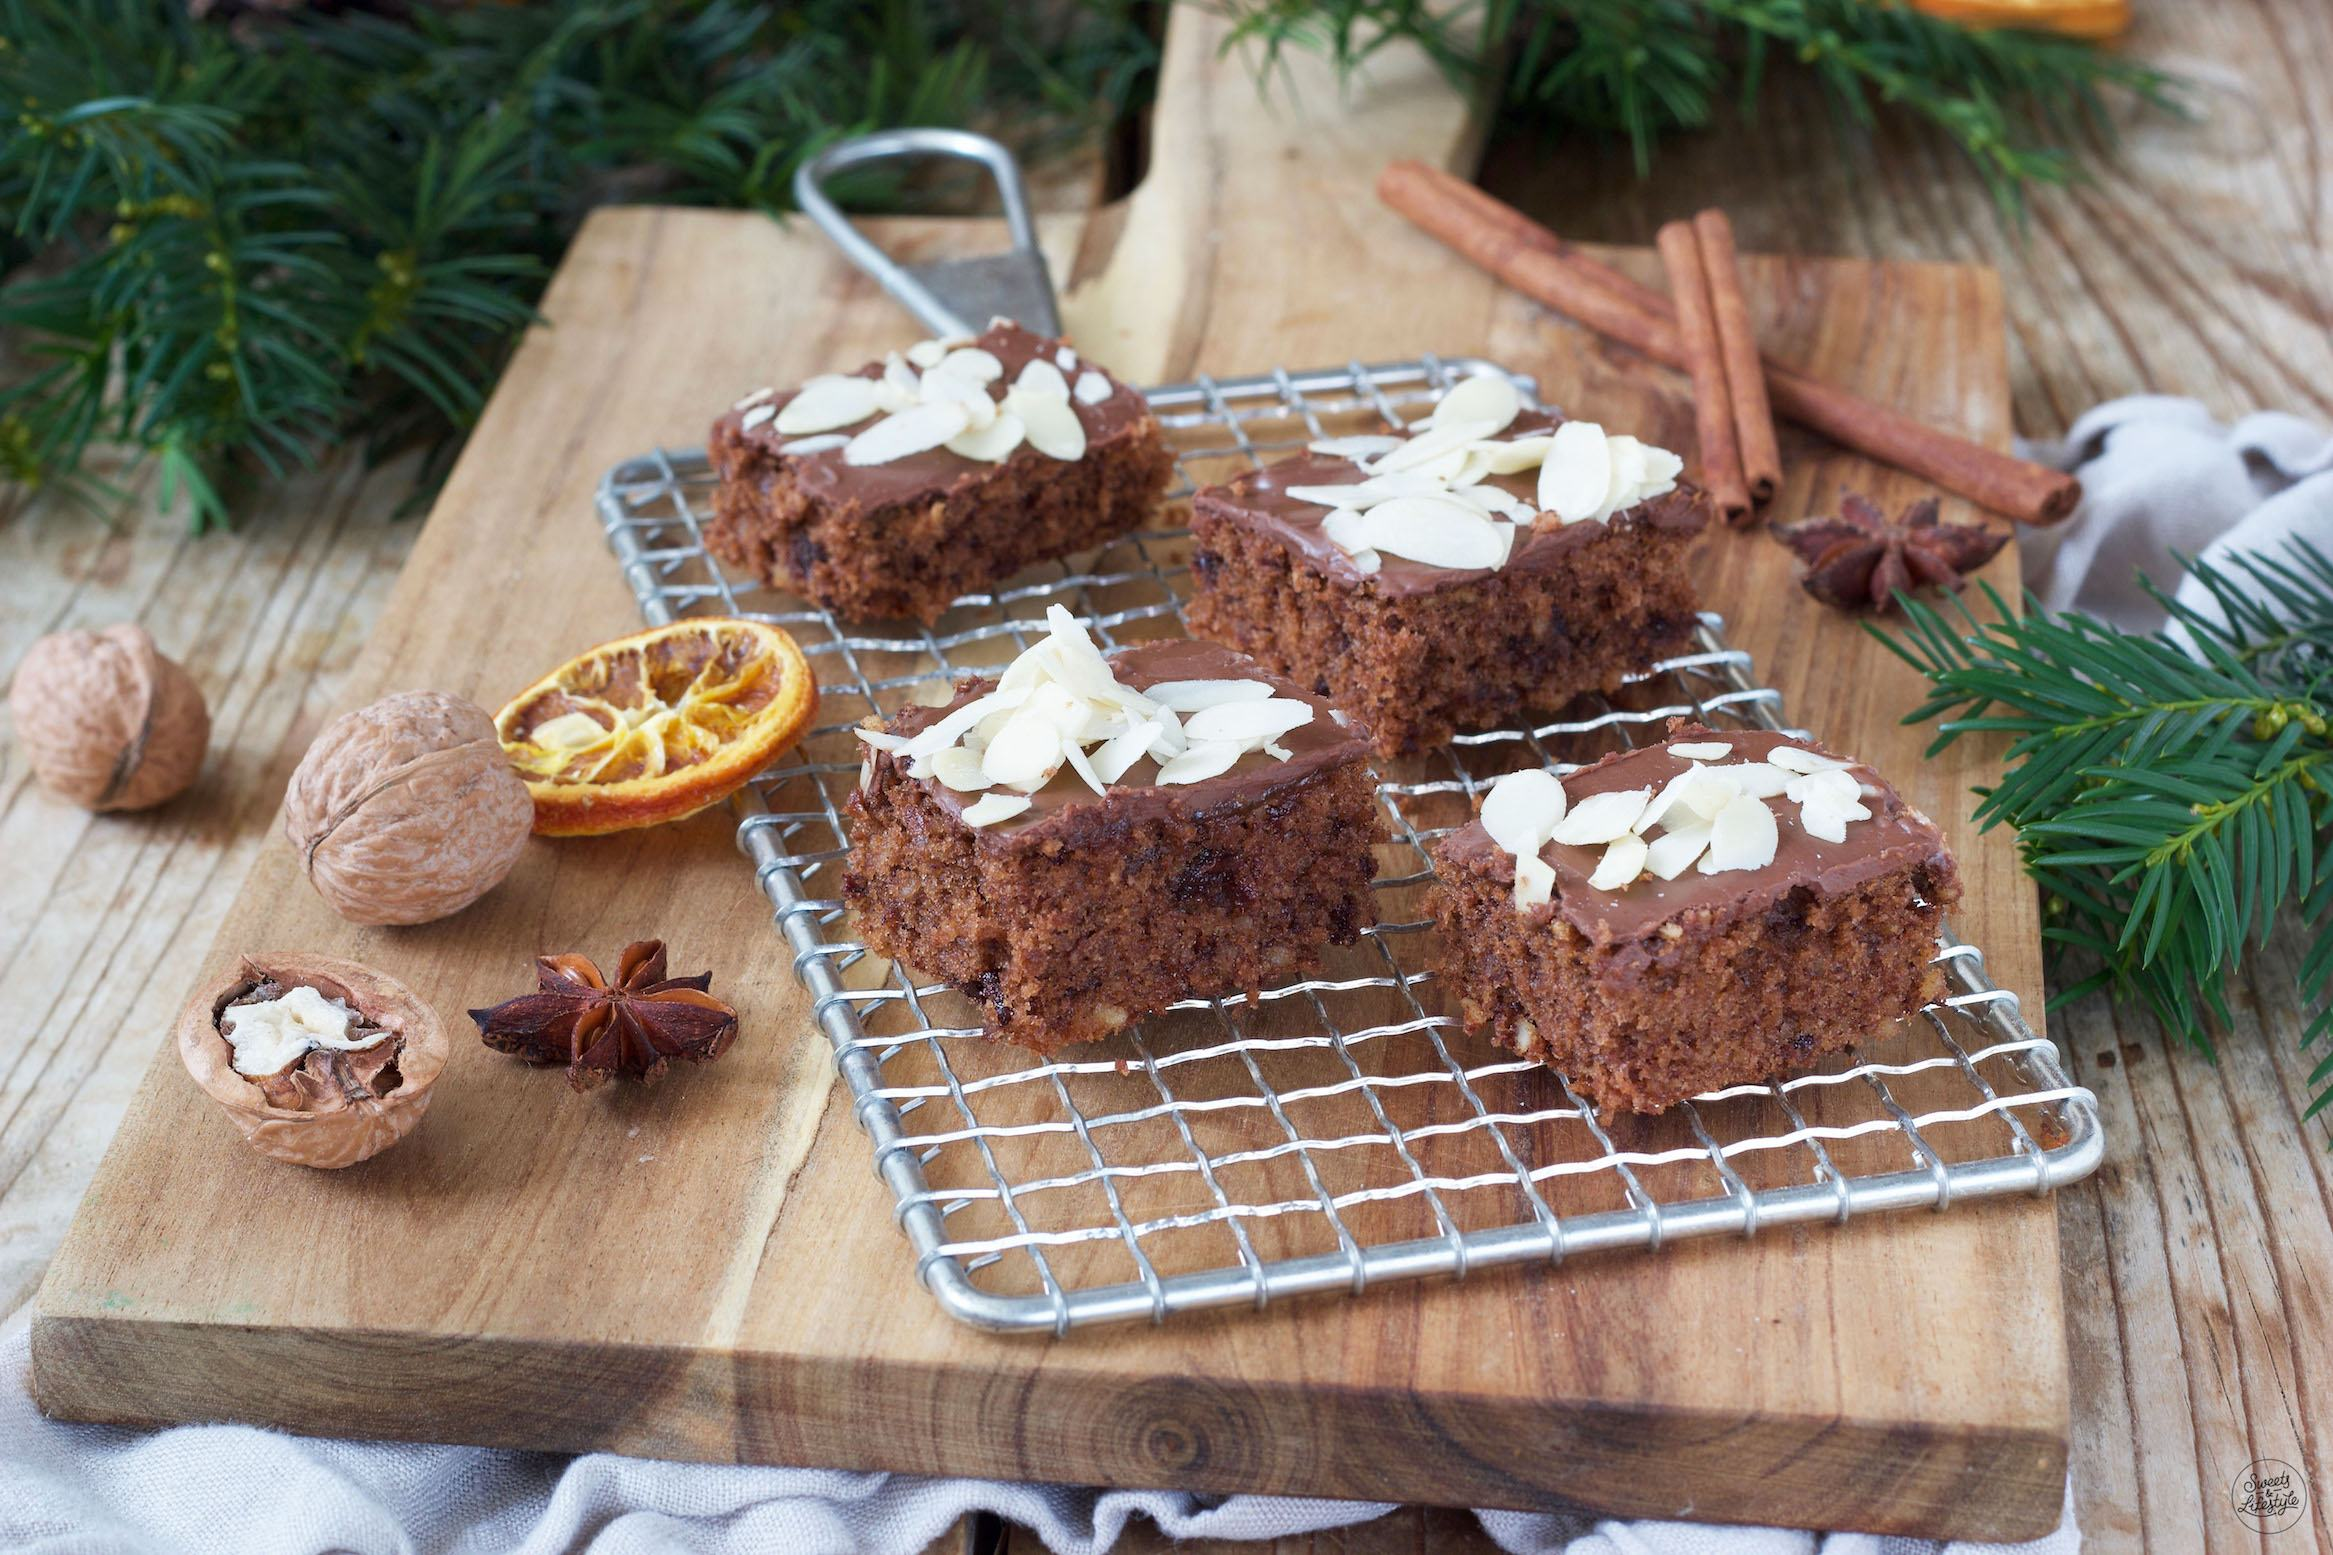 Schokolebkuchen Vom Blech Rezept Sweets Lifestyle